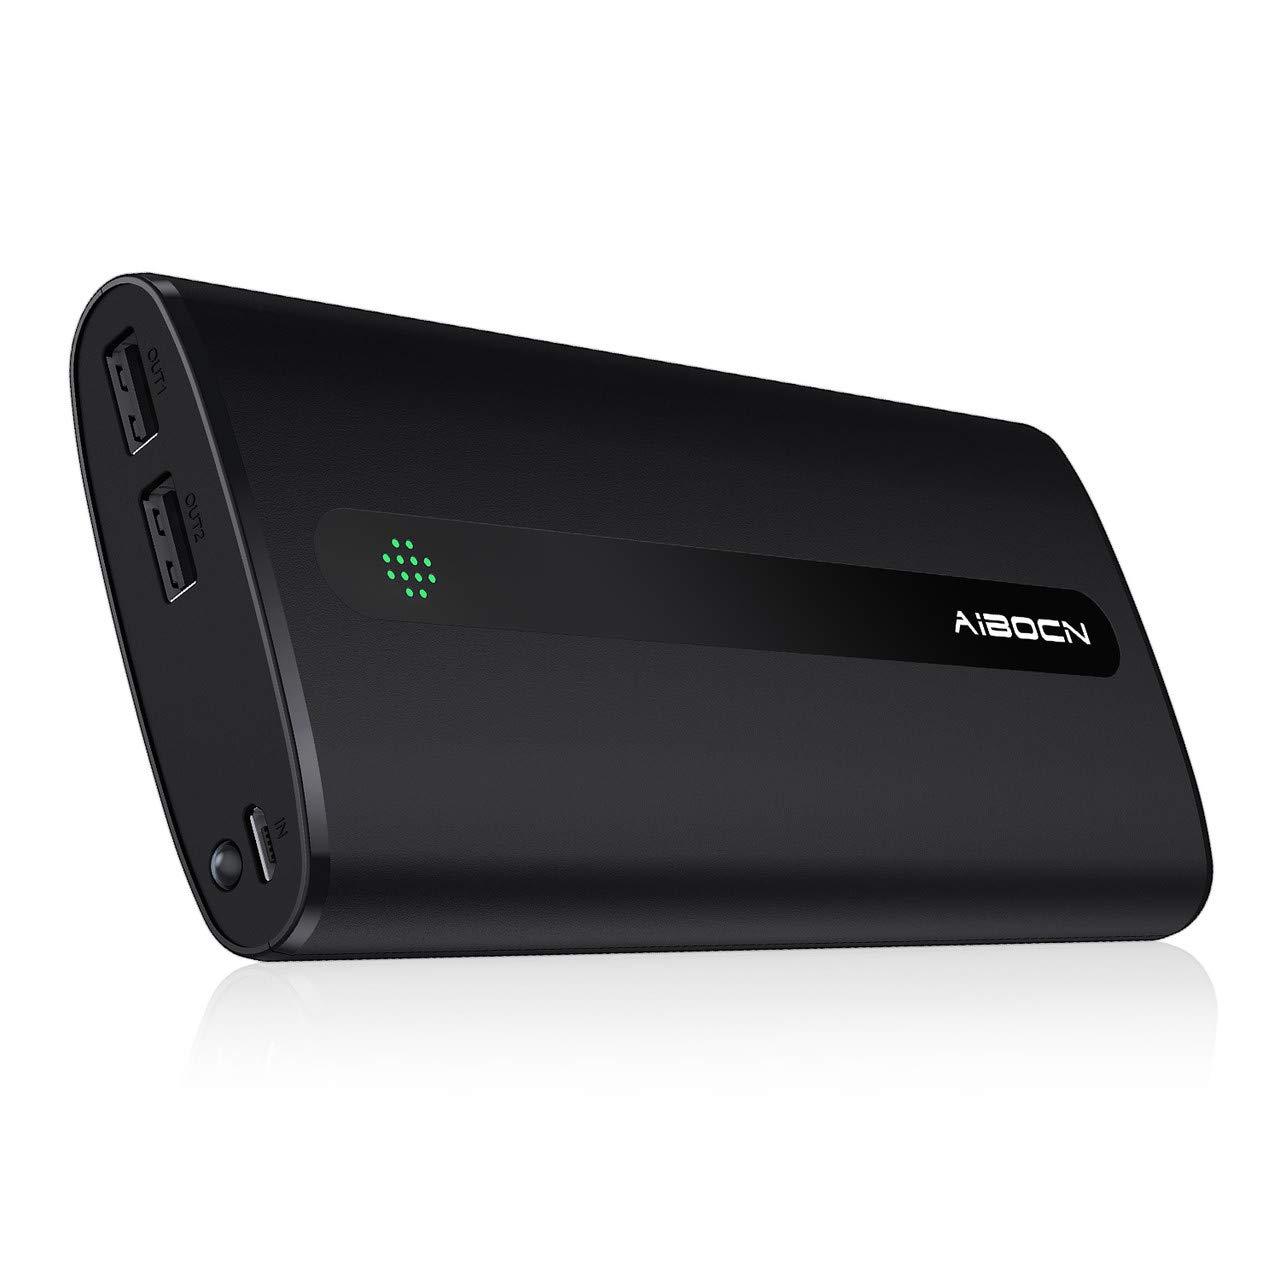 Amazon.com: Aibocn 20000mAh Cargador Portátil Batería ...